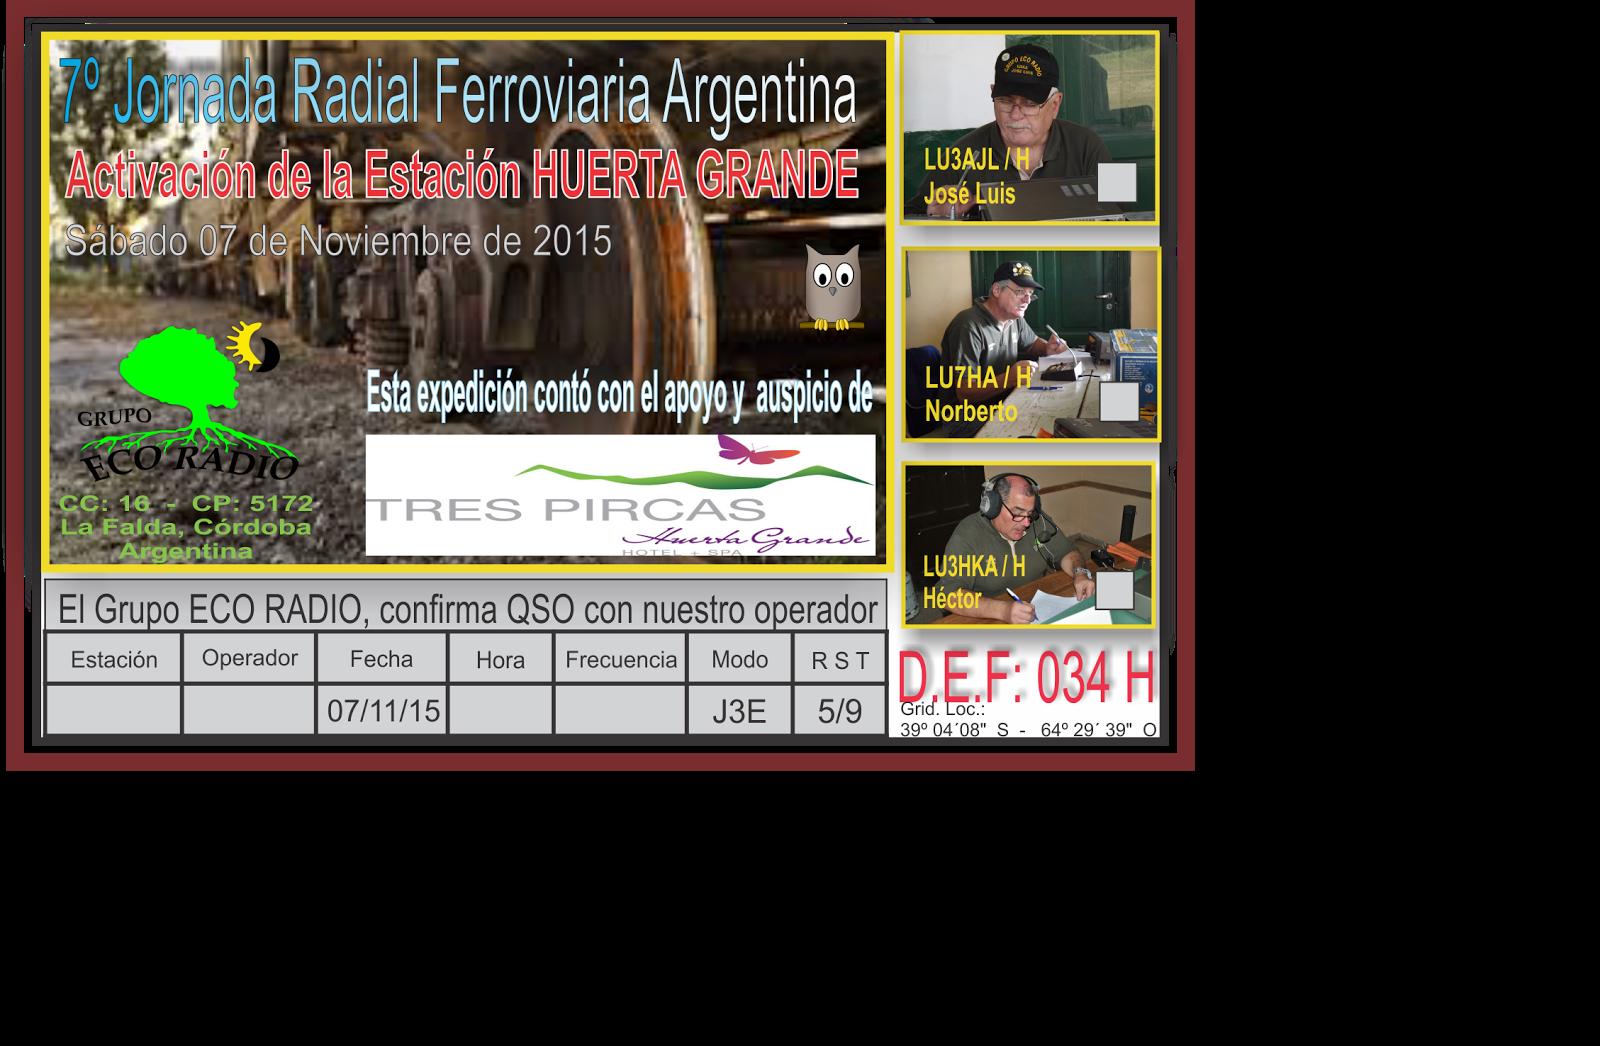 QSL Especial 7º Jornada Radial Ferroviaria 2015